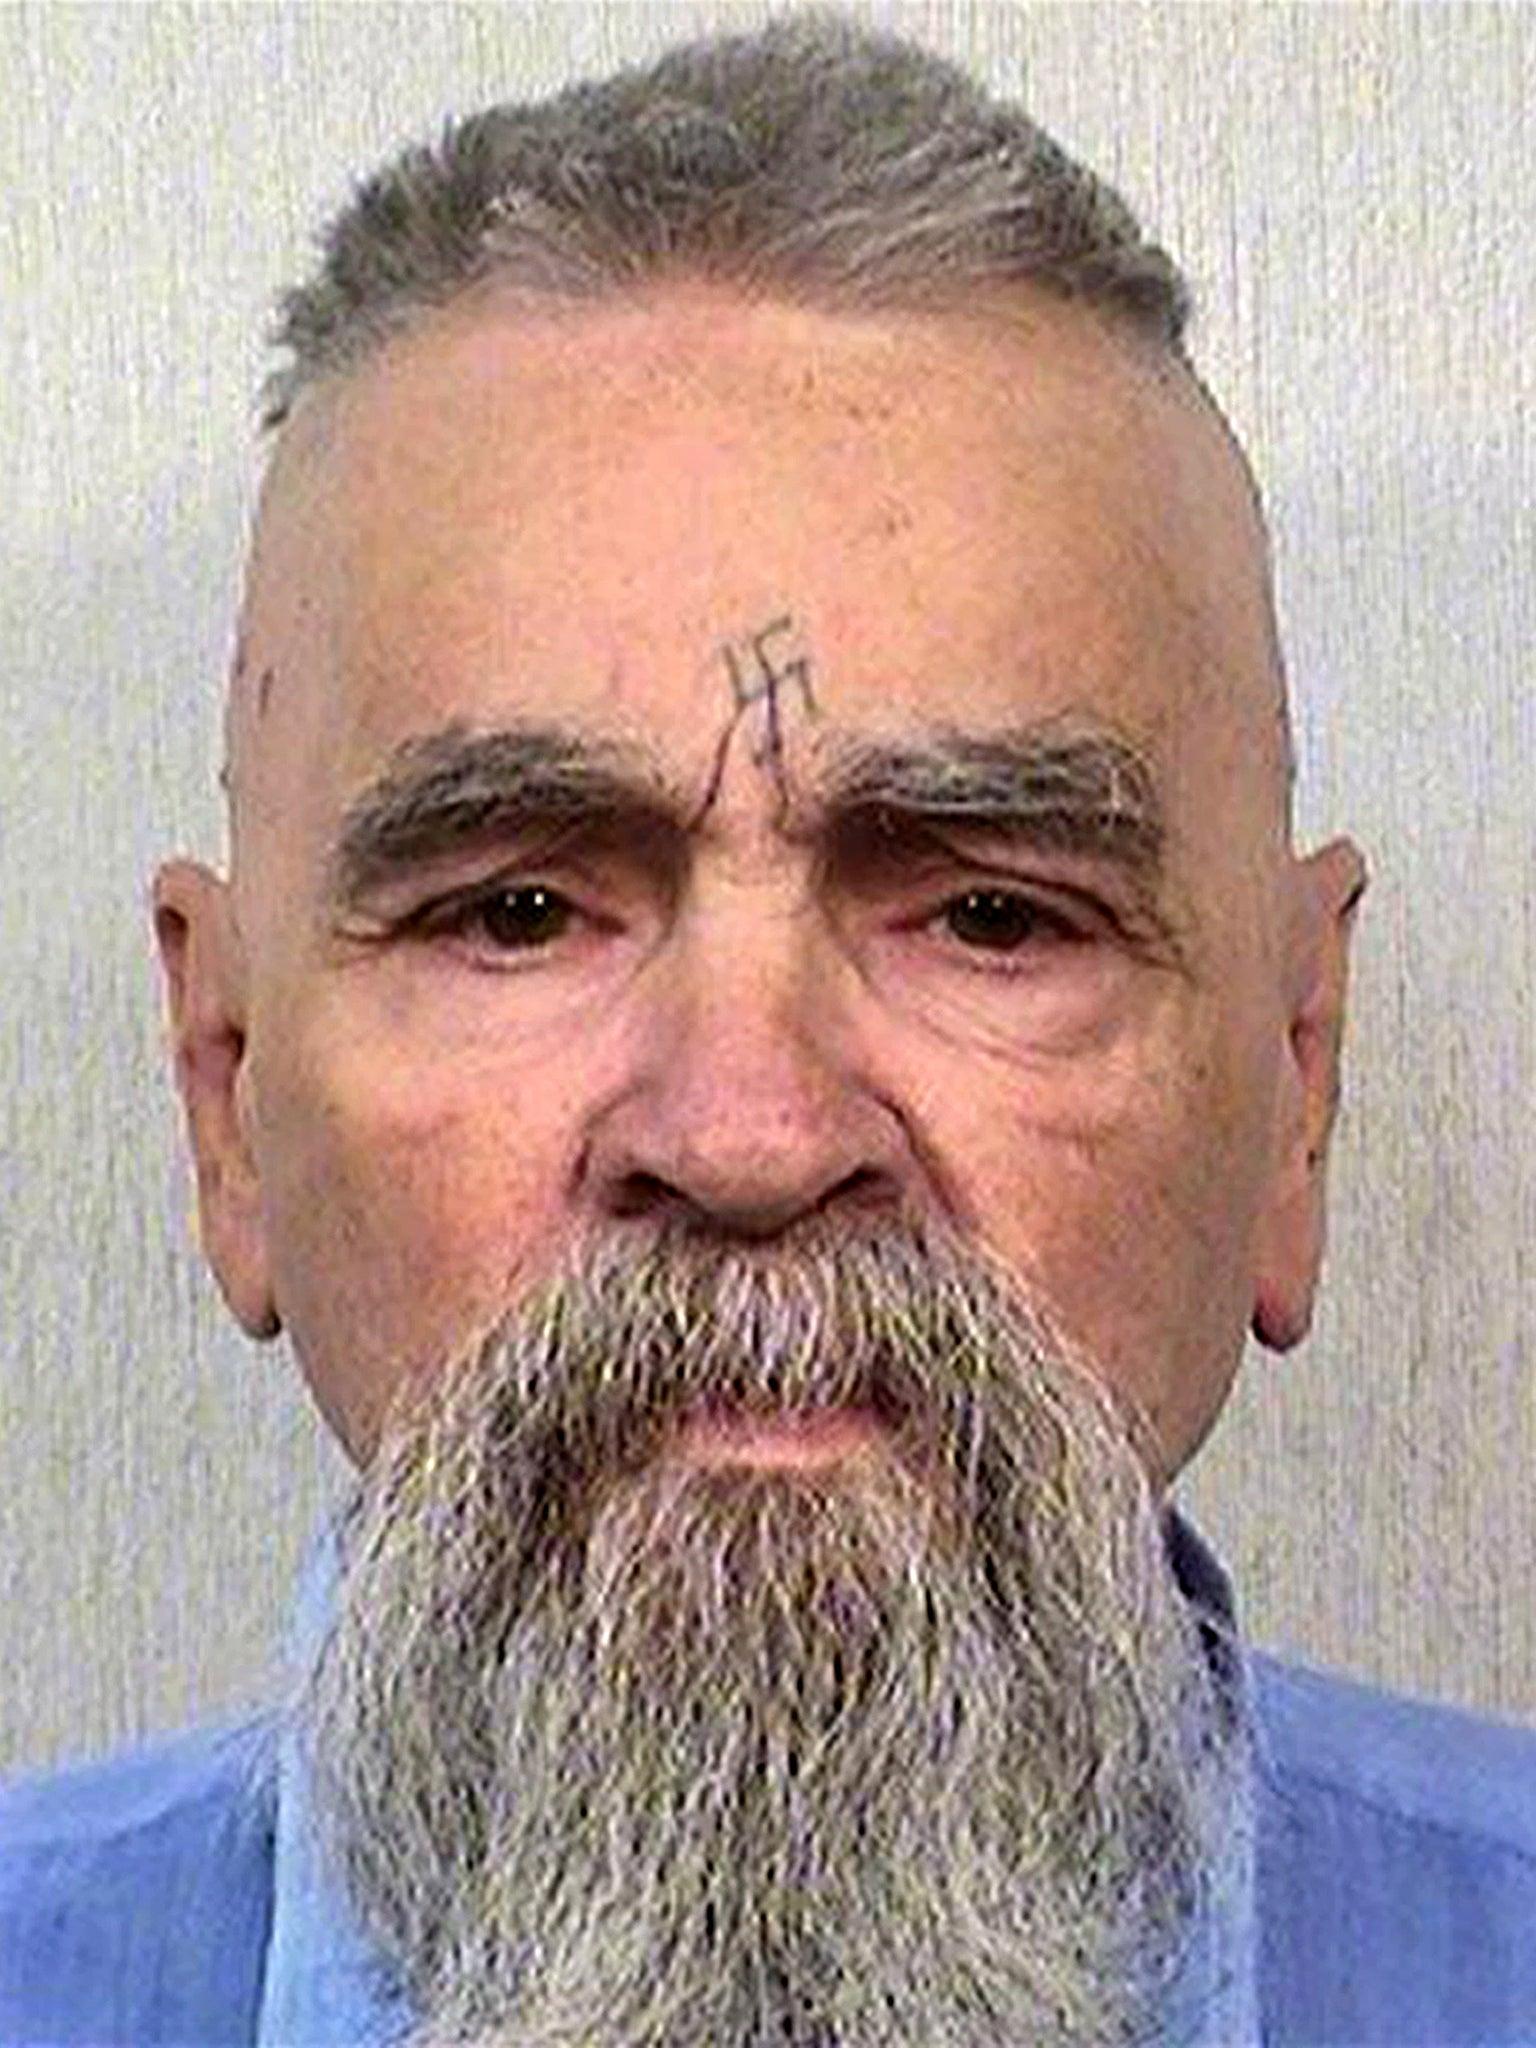 Charles Manson dead: Notorious serial killer and cult leader dies